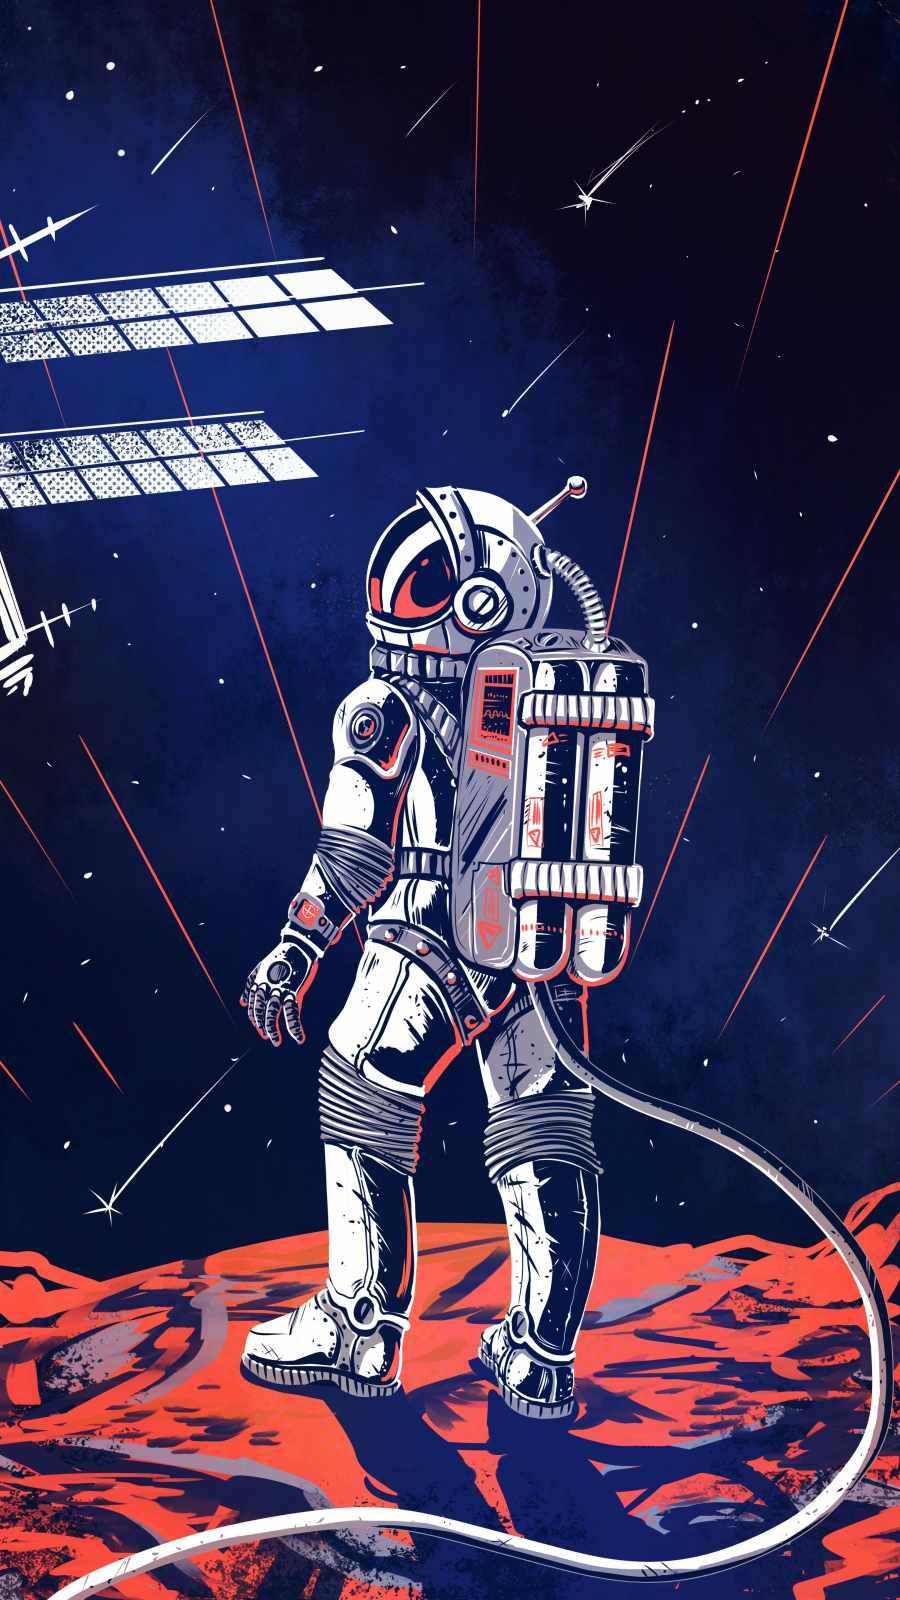 Mission Mars Astronaut